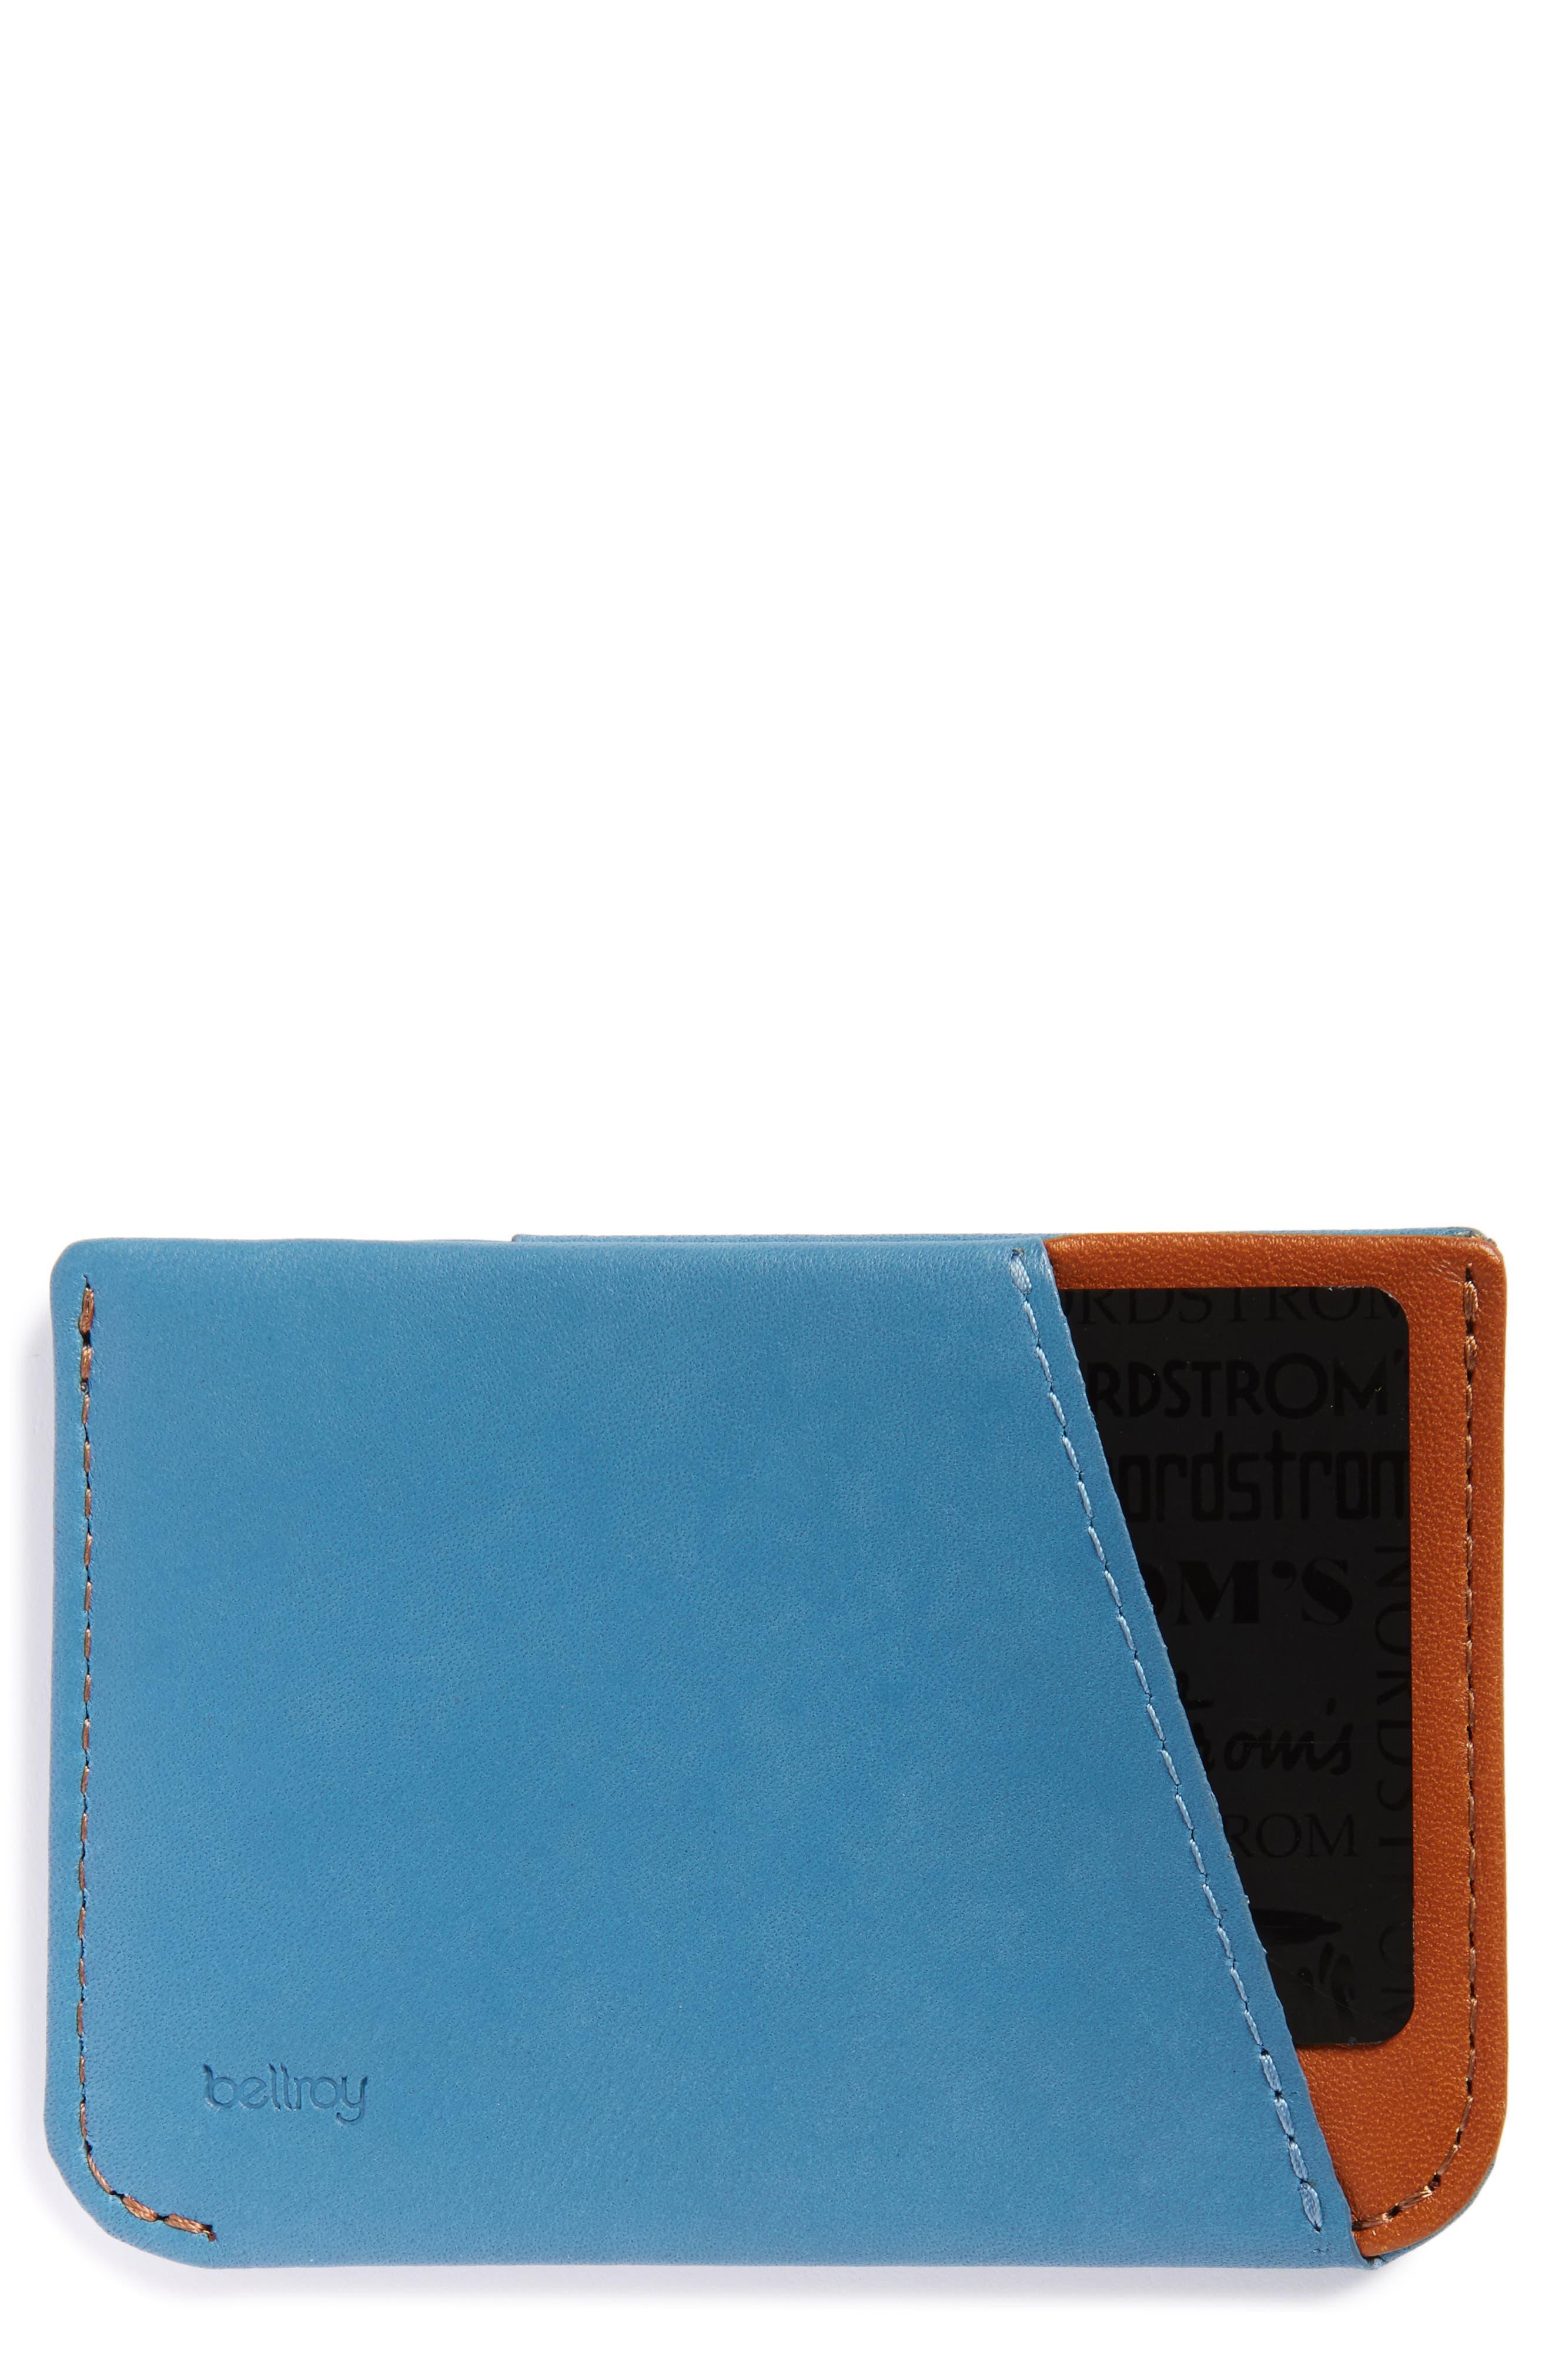 Micro Sleeve Card Case,                             Main thumbnail 1, color,                             Arctic Blue